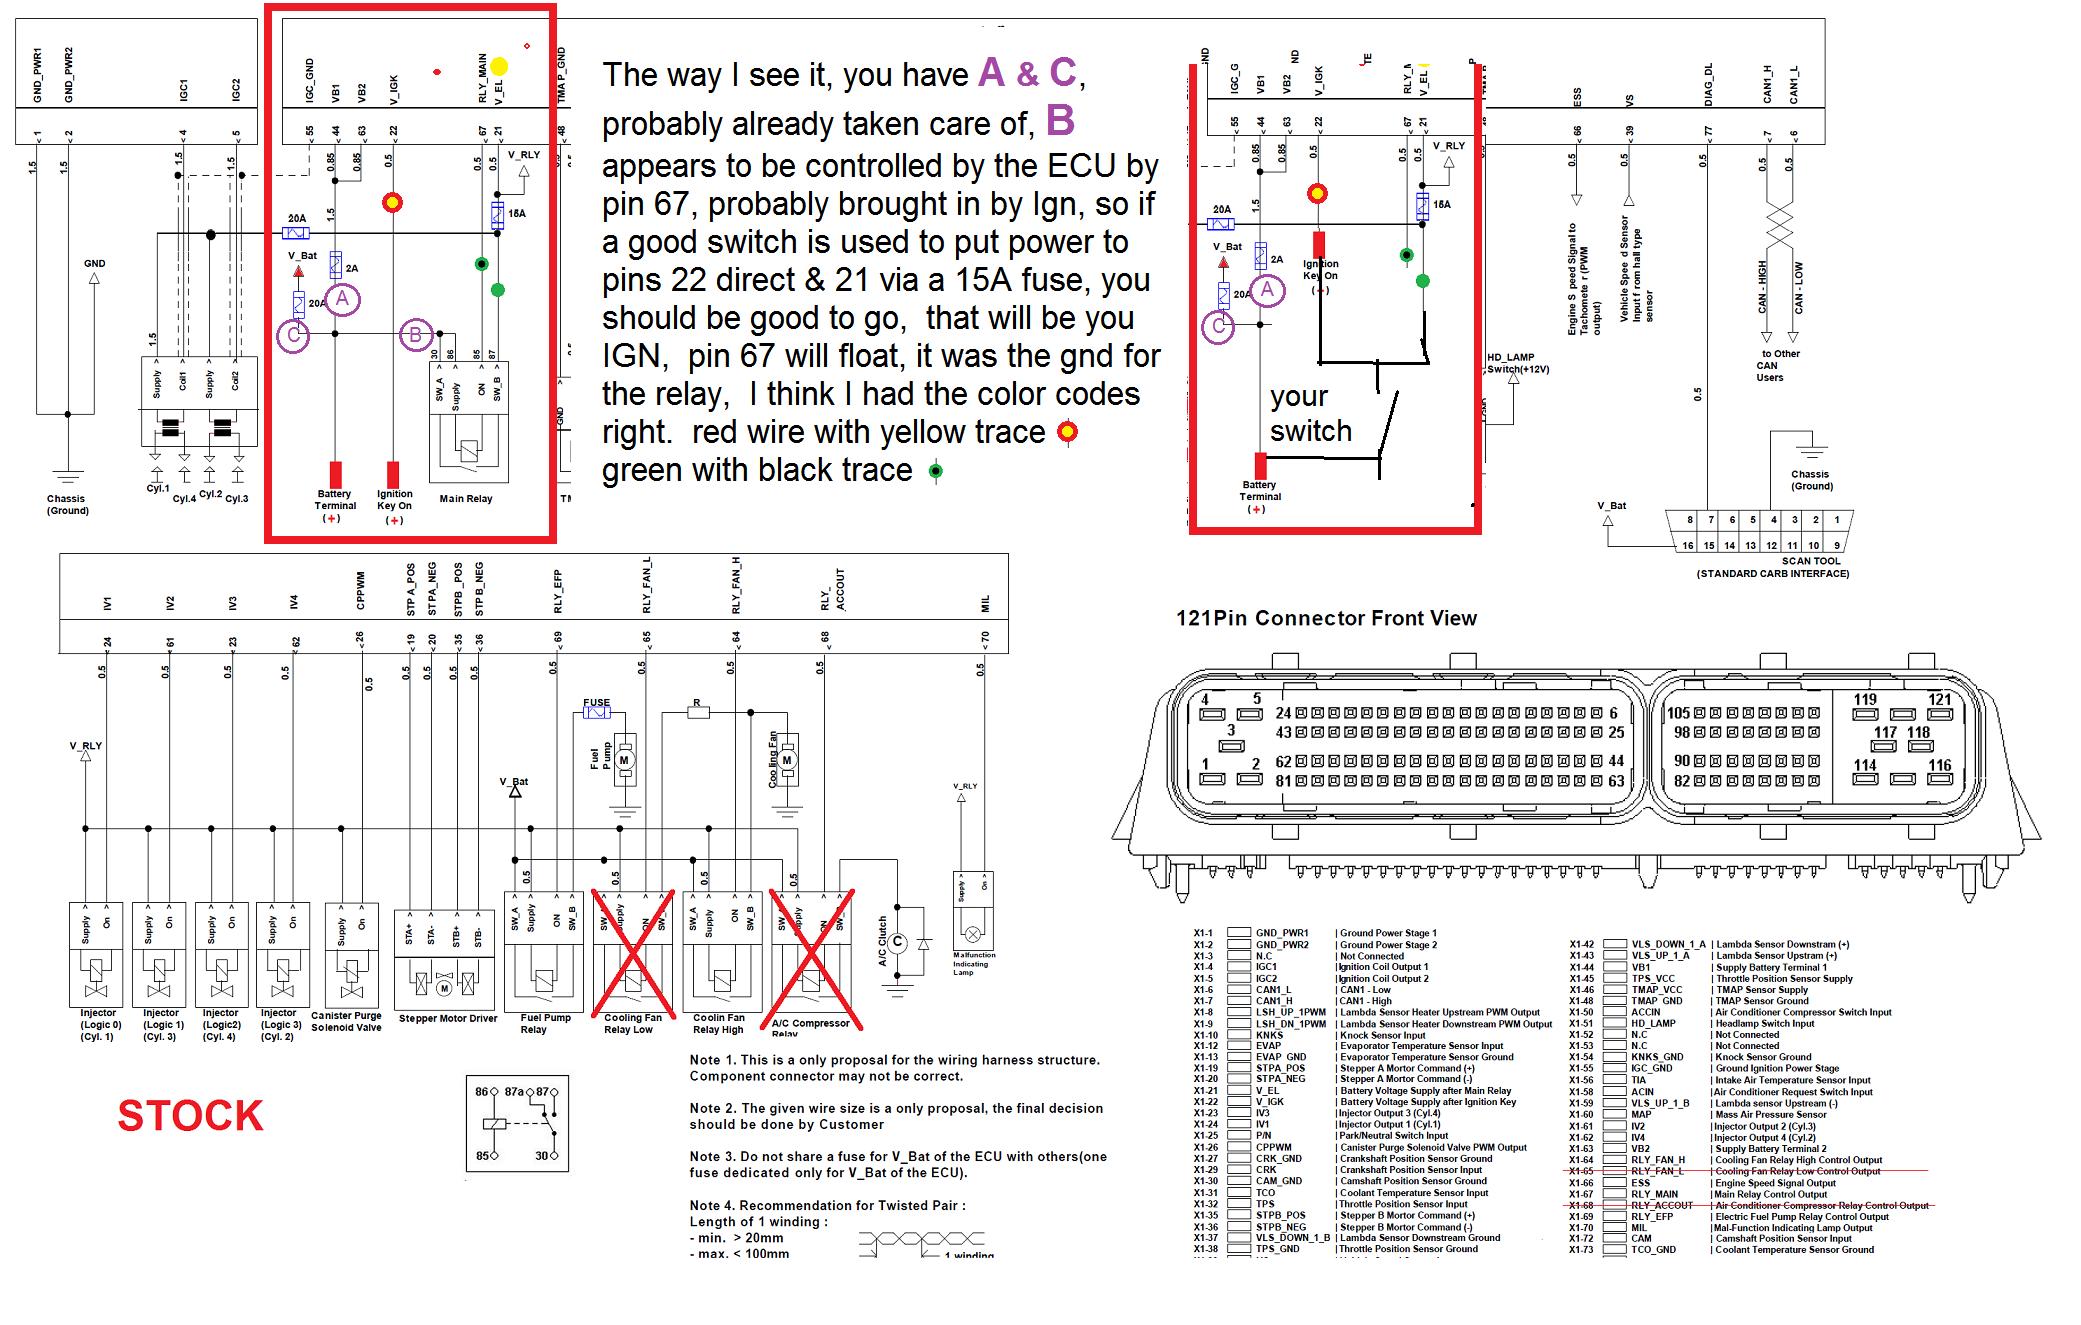 joyner trooper 1100cc joyner utv sxs forum utv board utv forum 71 charger starter relay diagram 58d0c58818b31_trooperecuswitch thumb png 68b4345afb9a6a2d382feaee2f0b37a6 png